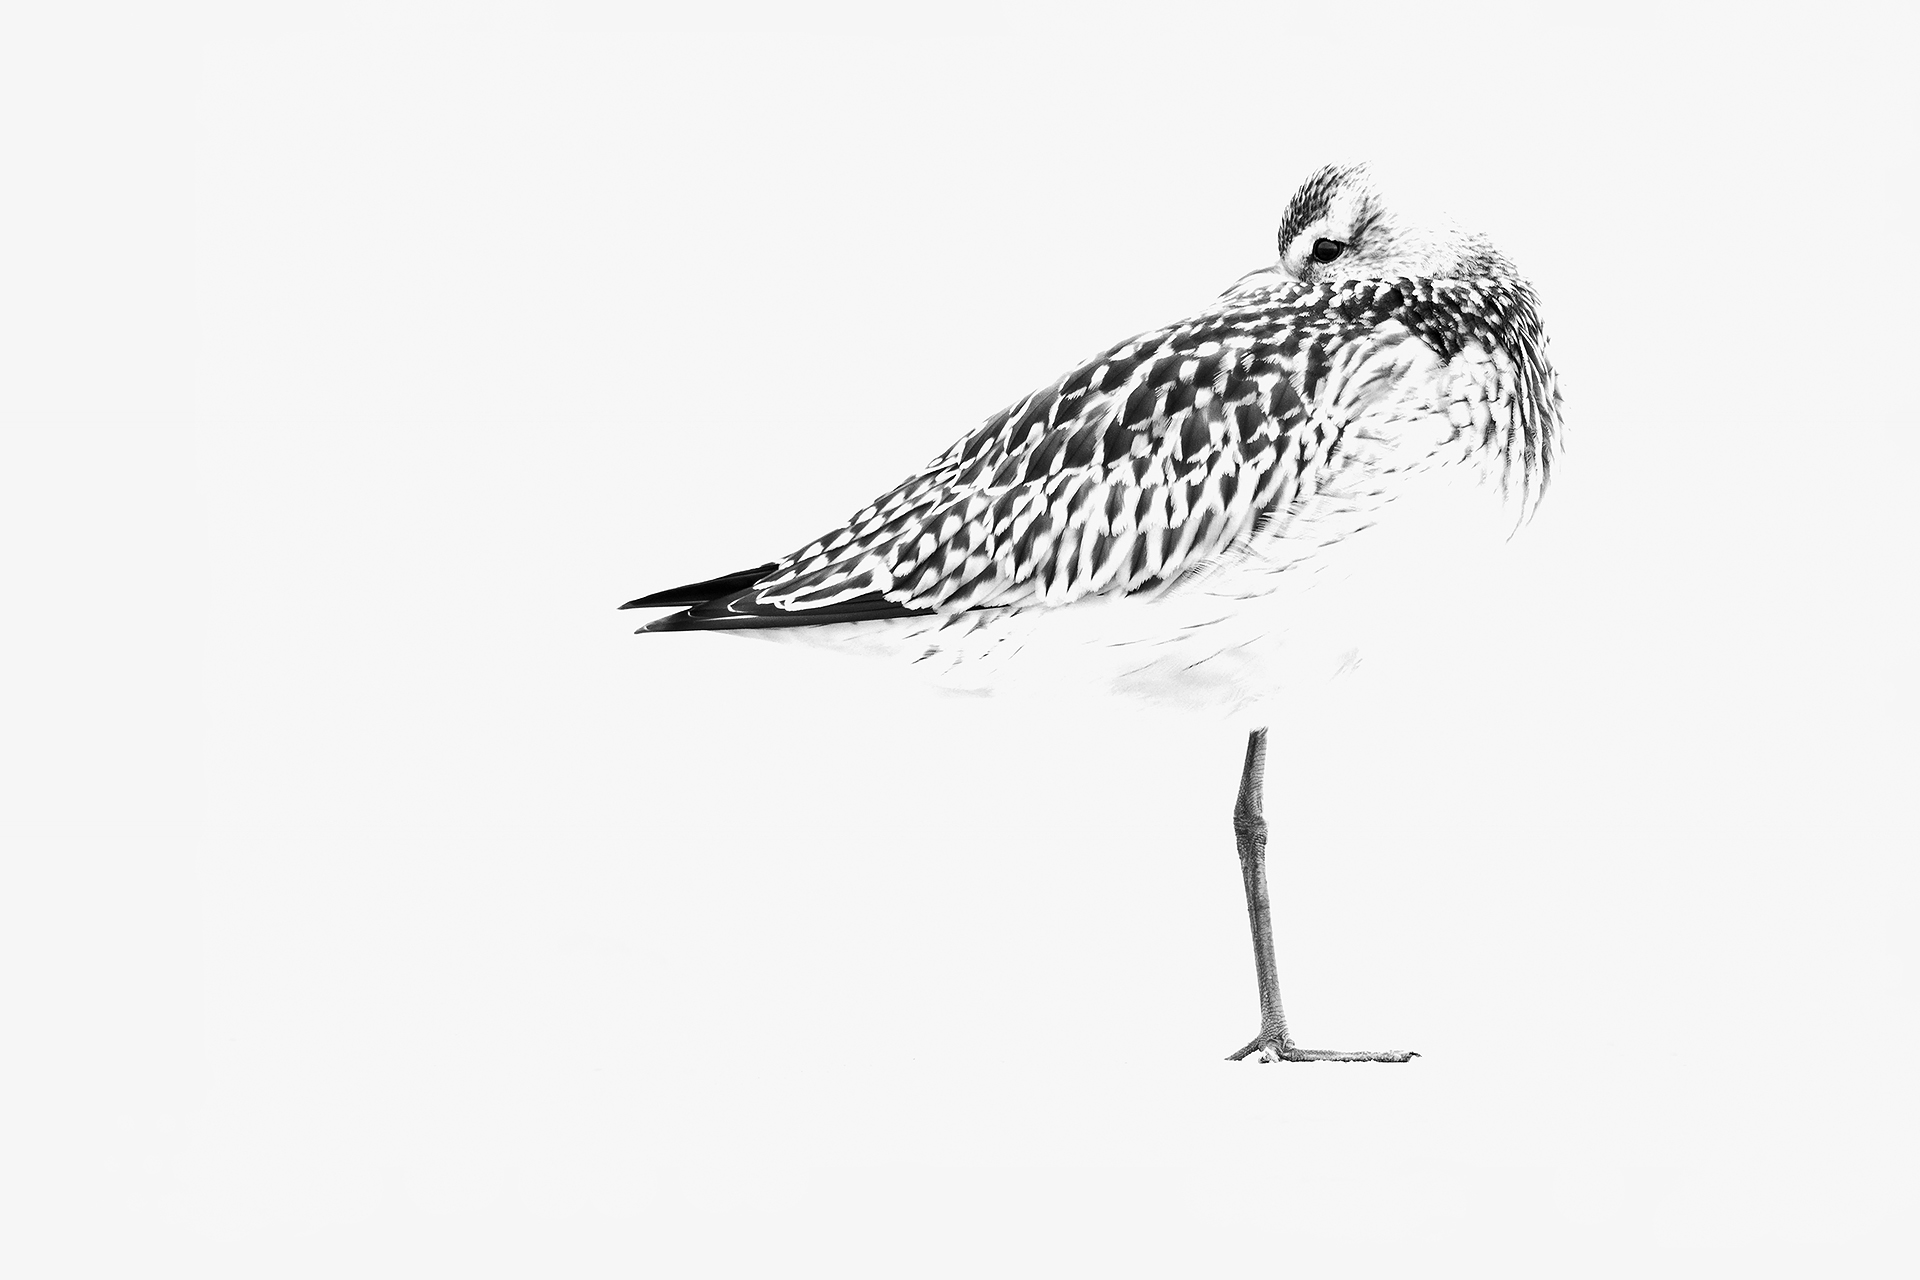 Carboncillo de aguja - Mario Suarez - Portfolio Natural, Fotografía de Naturaleza de Autor